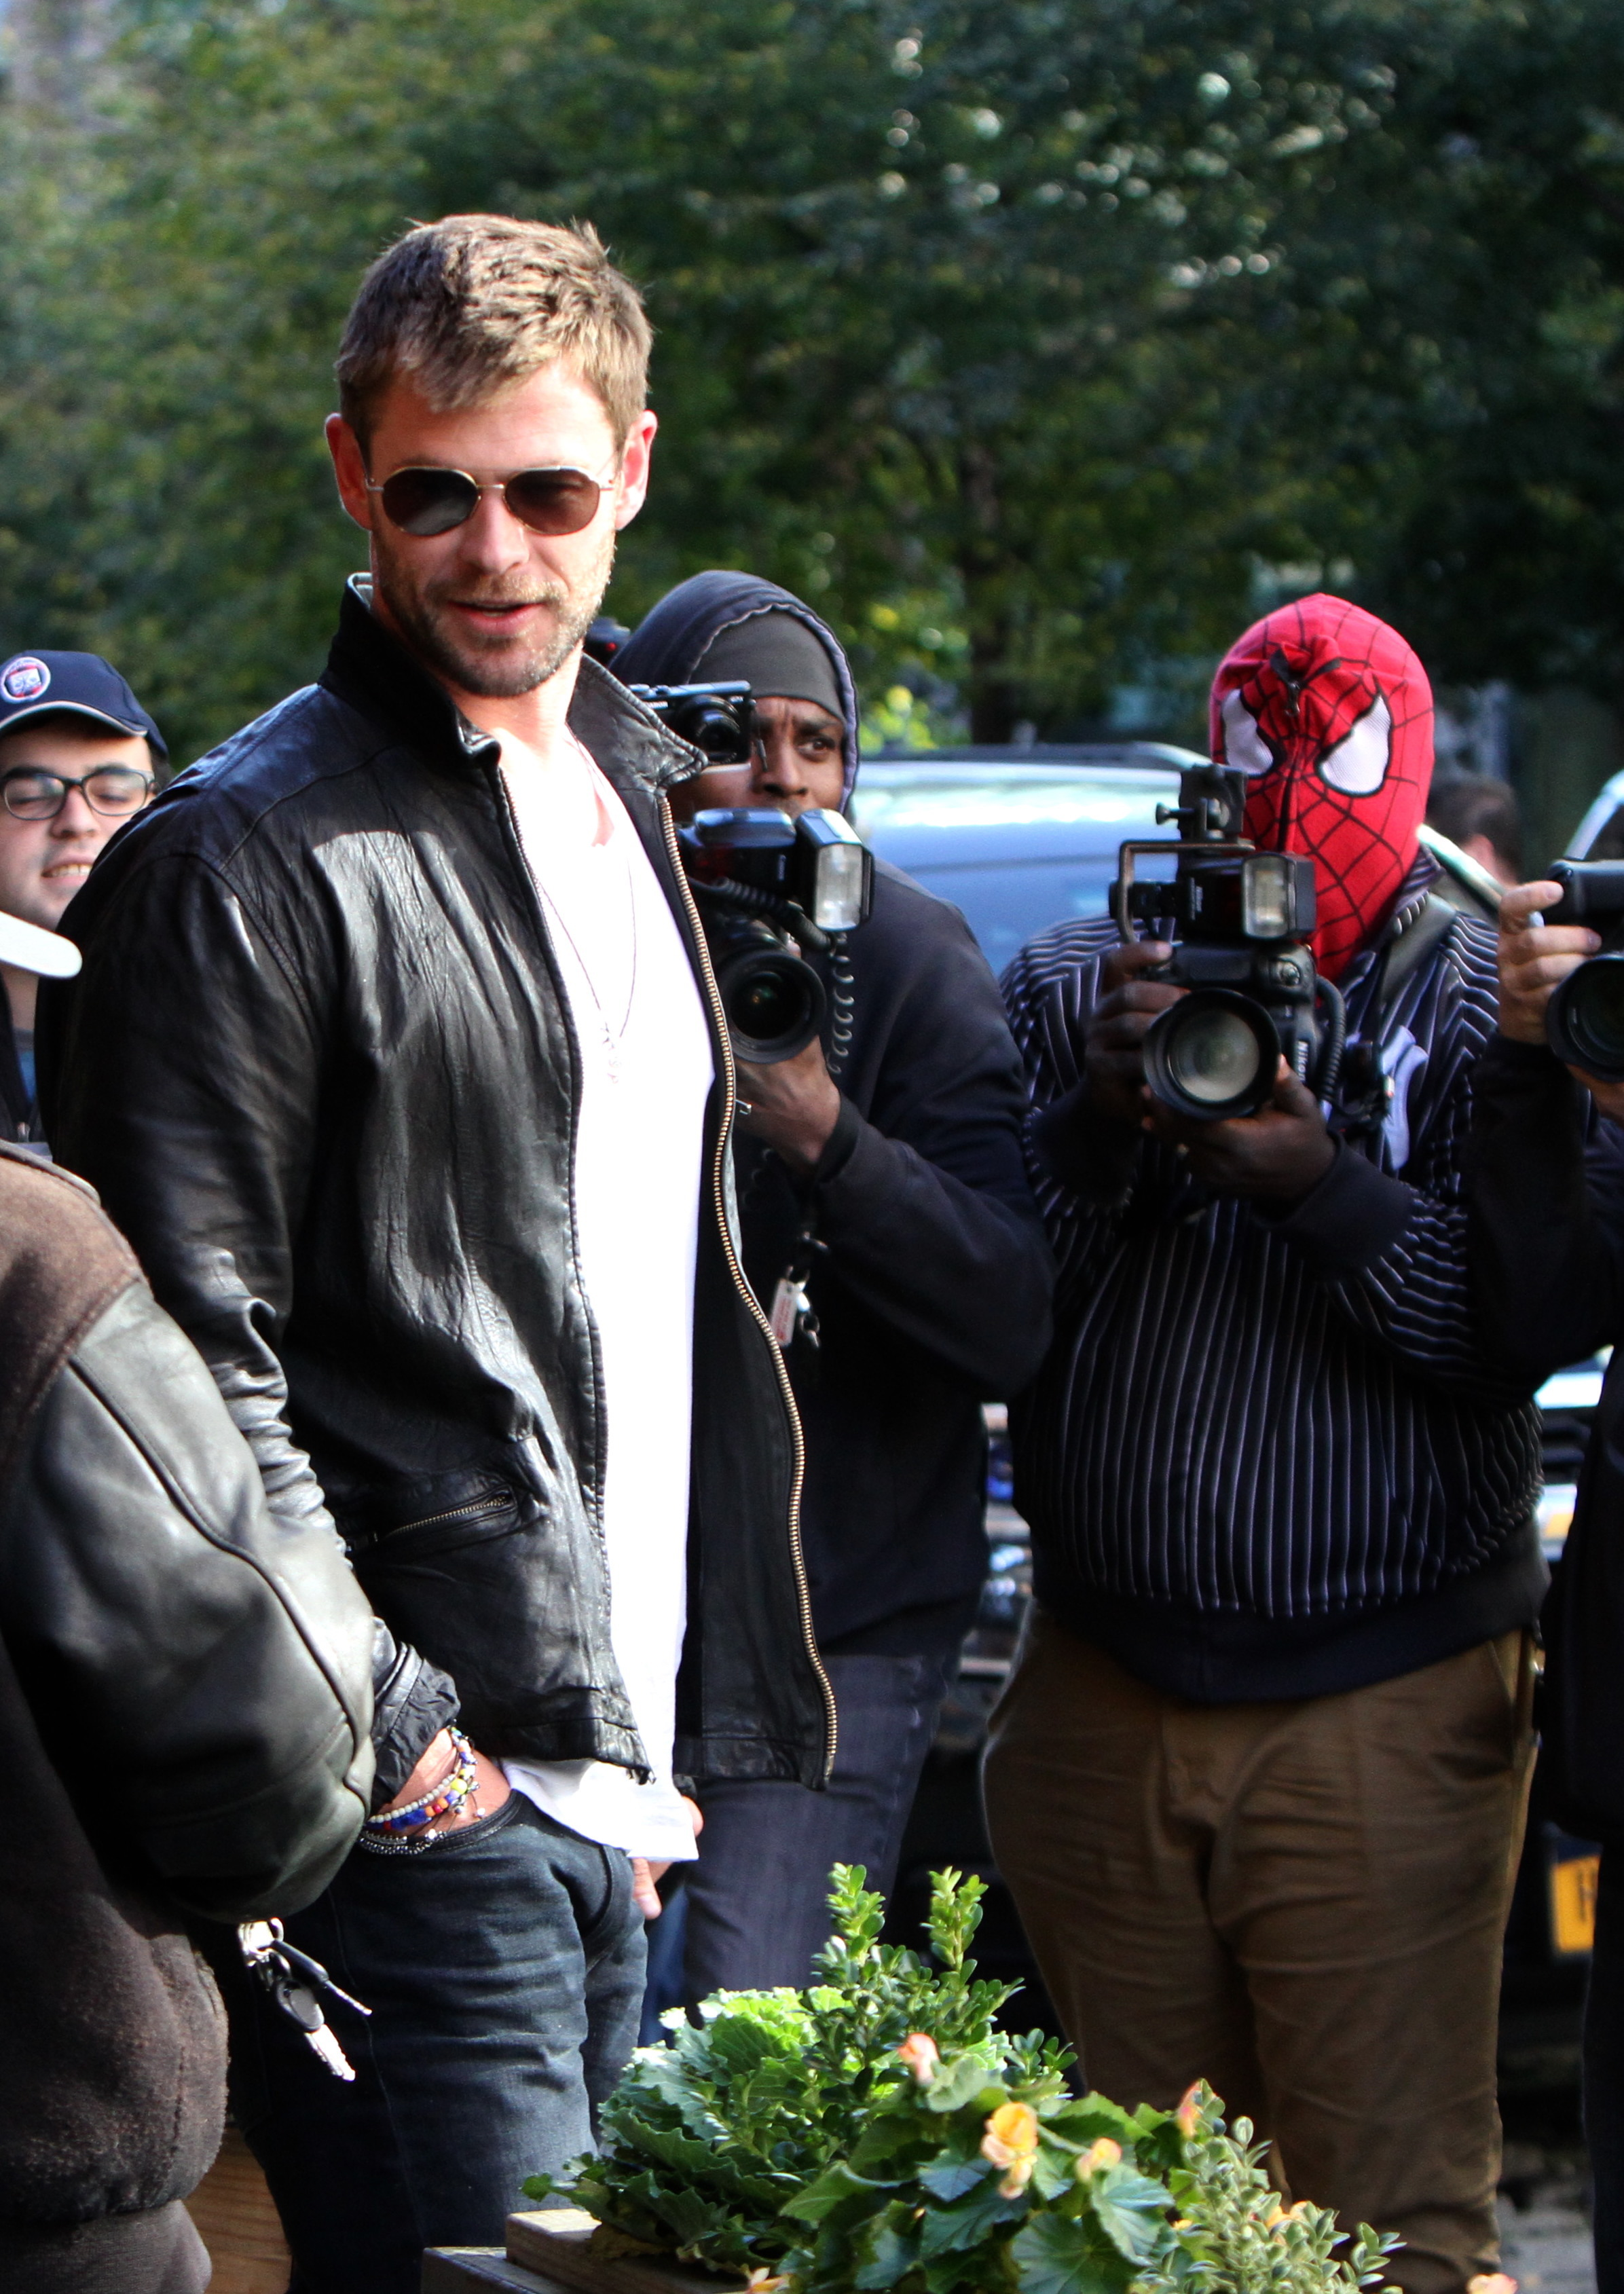 Chris Hemsworth smiles at paparazzi in New York City on Oct. 30, 2017.